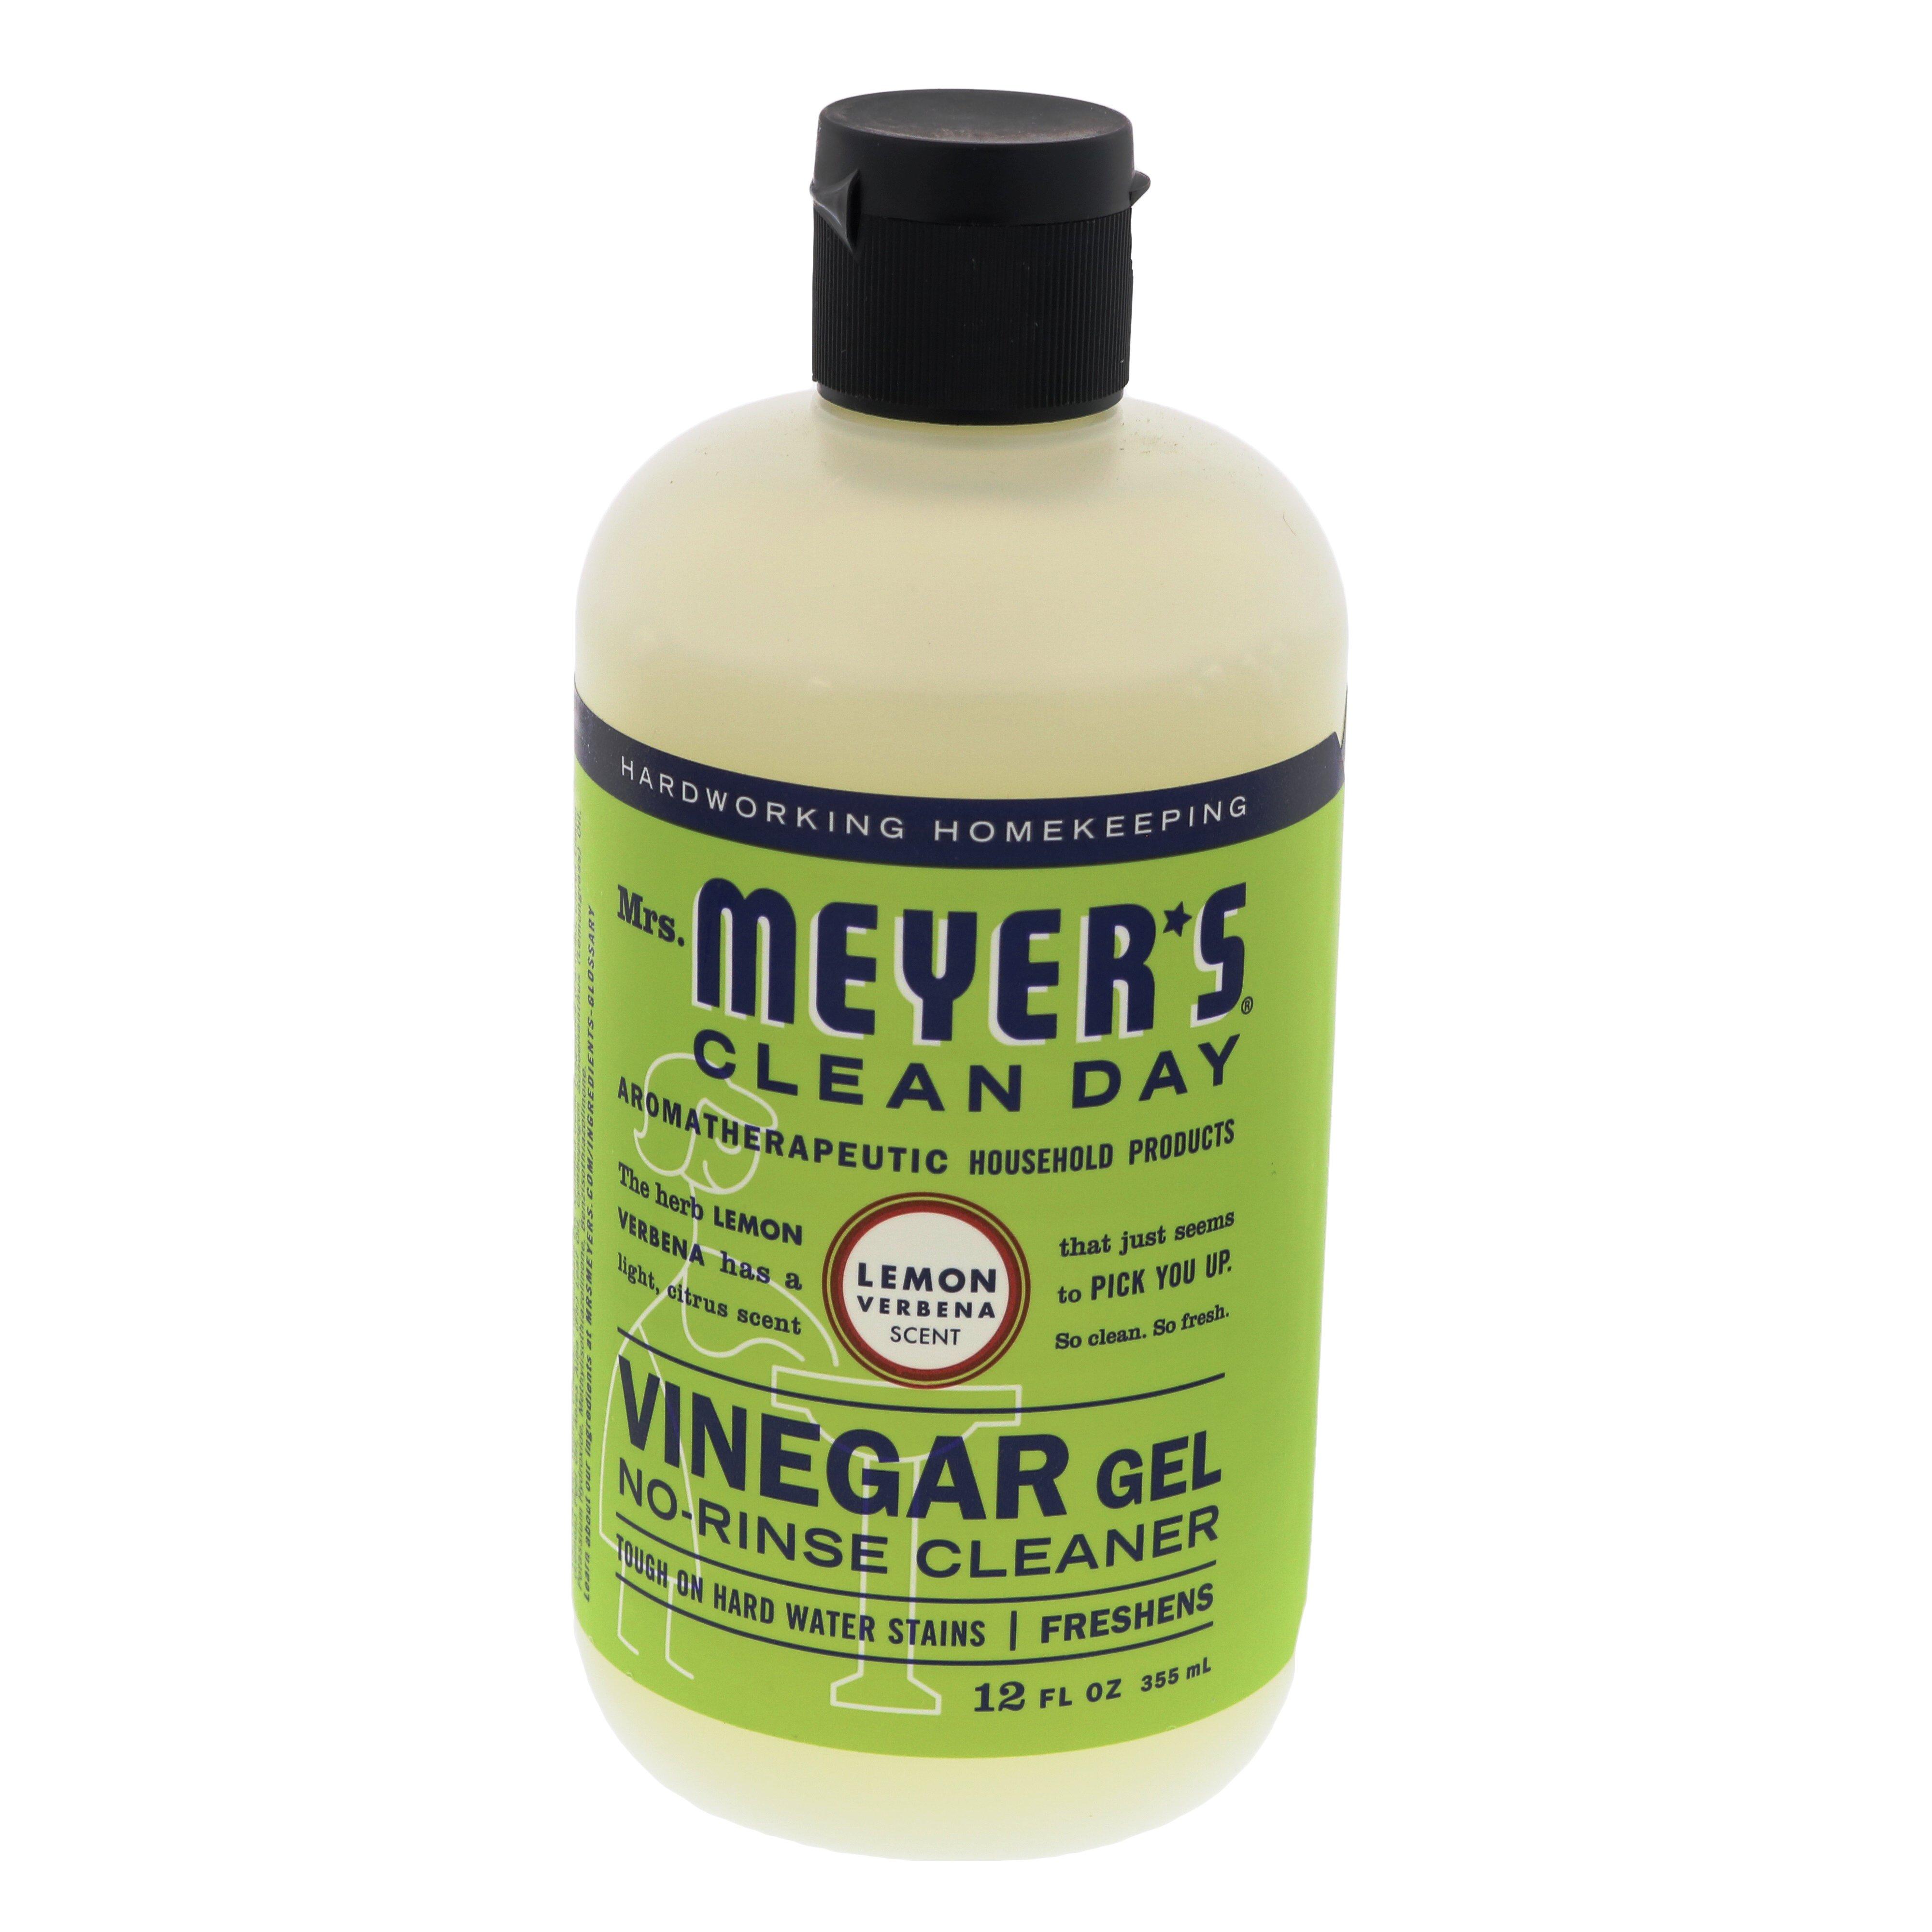 Vinegar Gel Cleaner Lemon Verbena